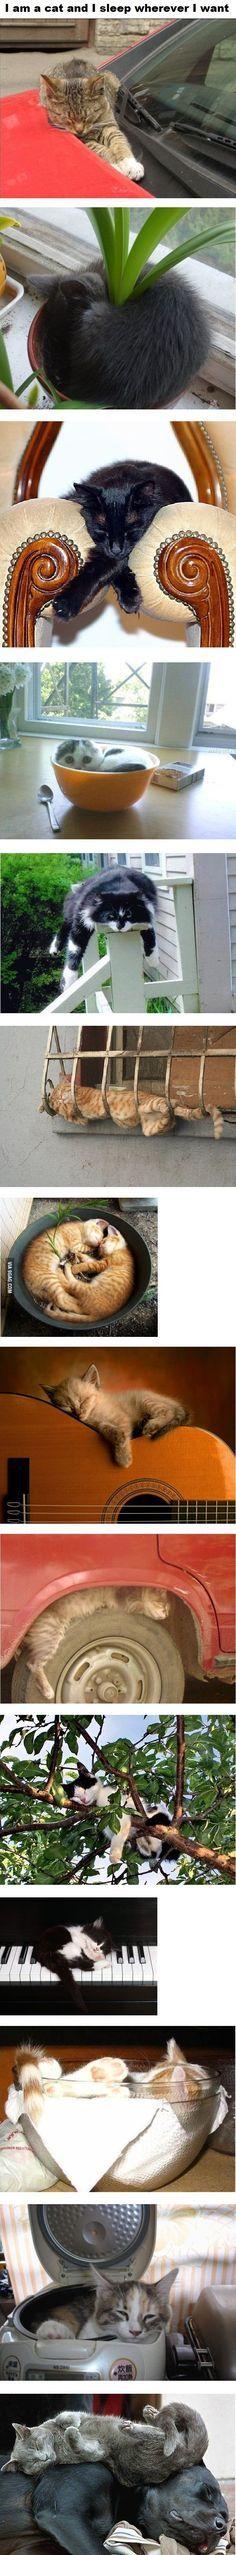 I am a cat and I can sleep wherever I want